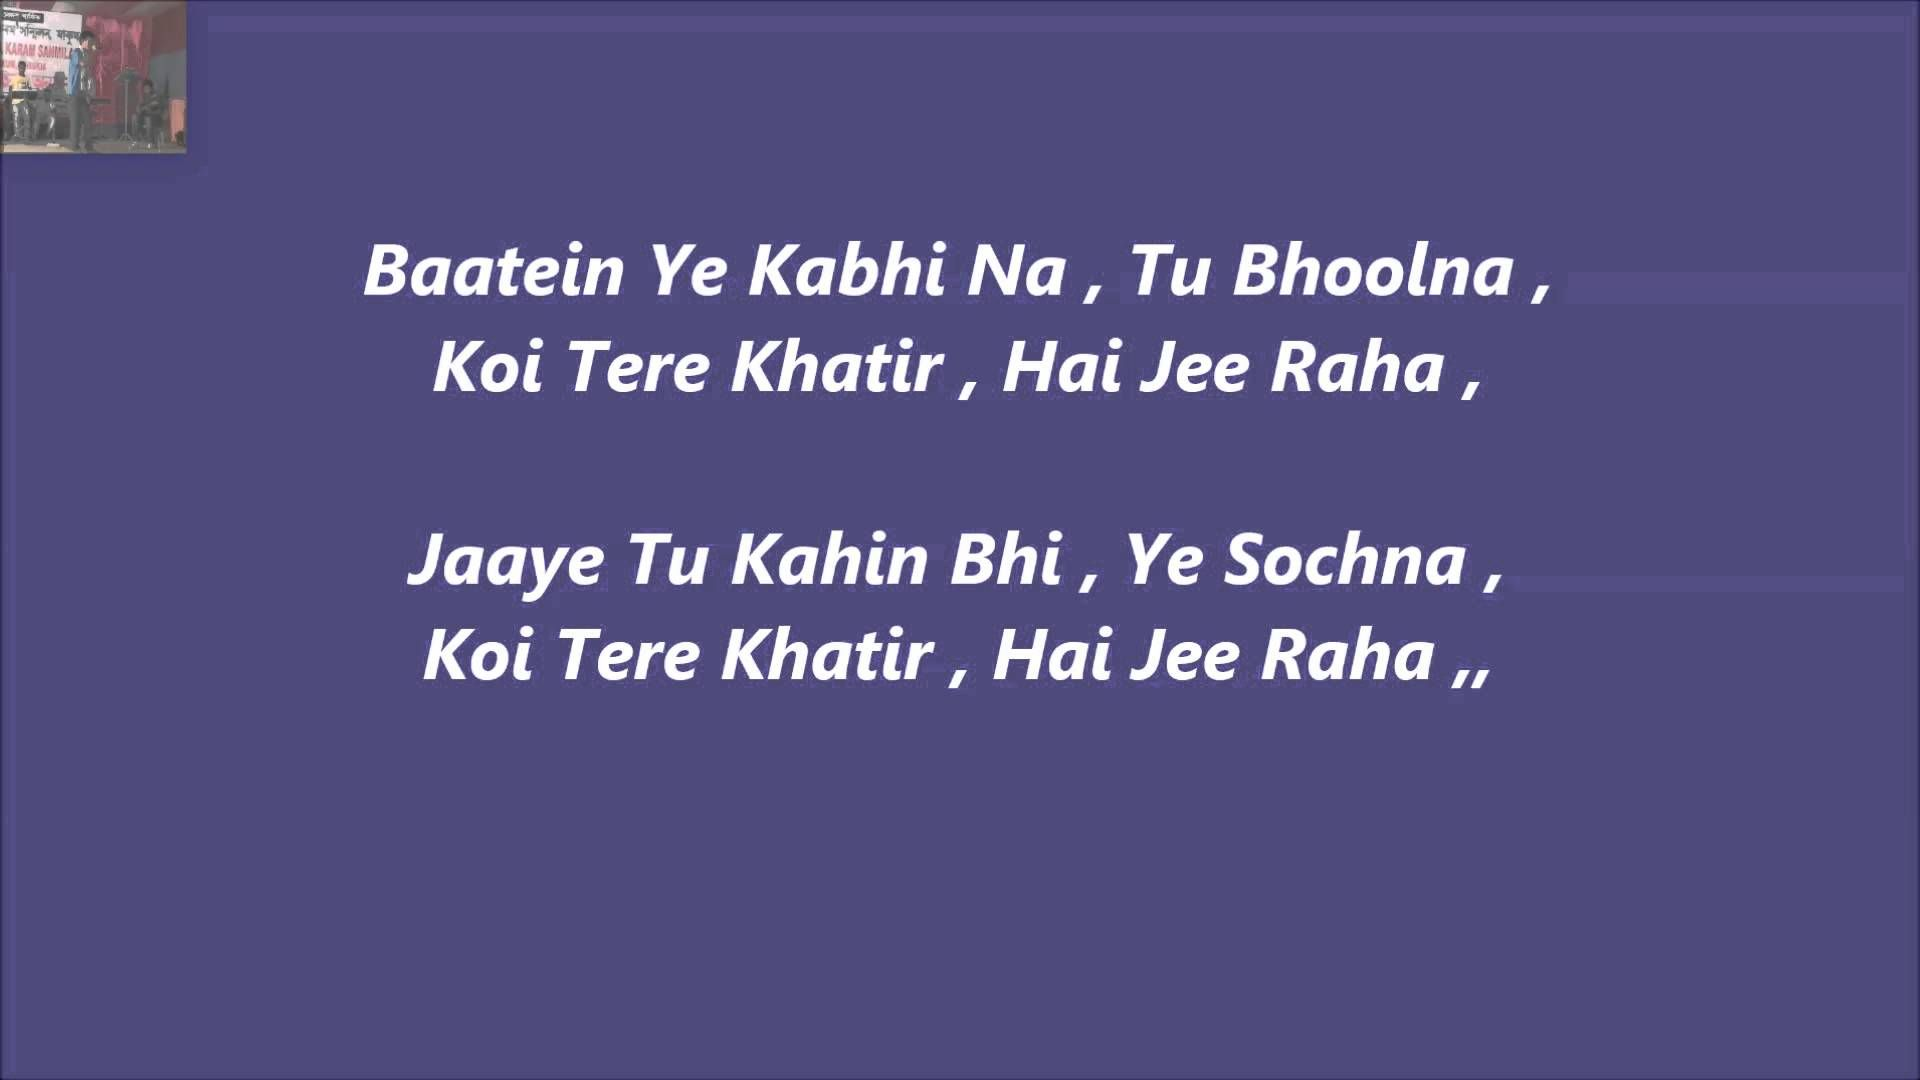 Baatein Ye Kabhi Na Karaoke With Lyrics Khamosiyaan Lyrics Karaoke Beautiful Lyrics